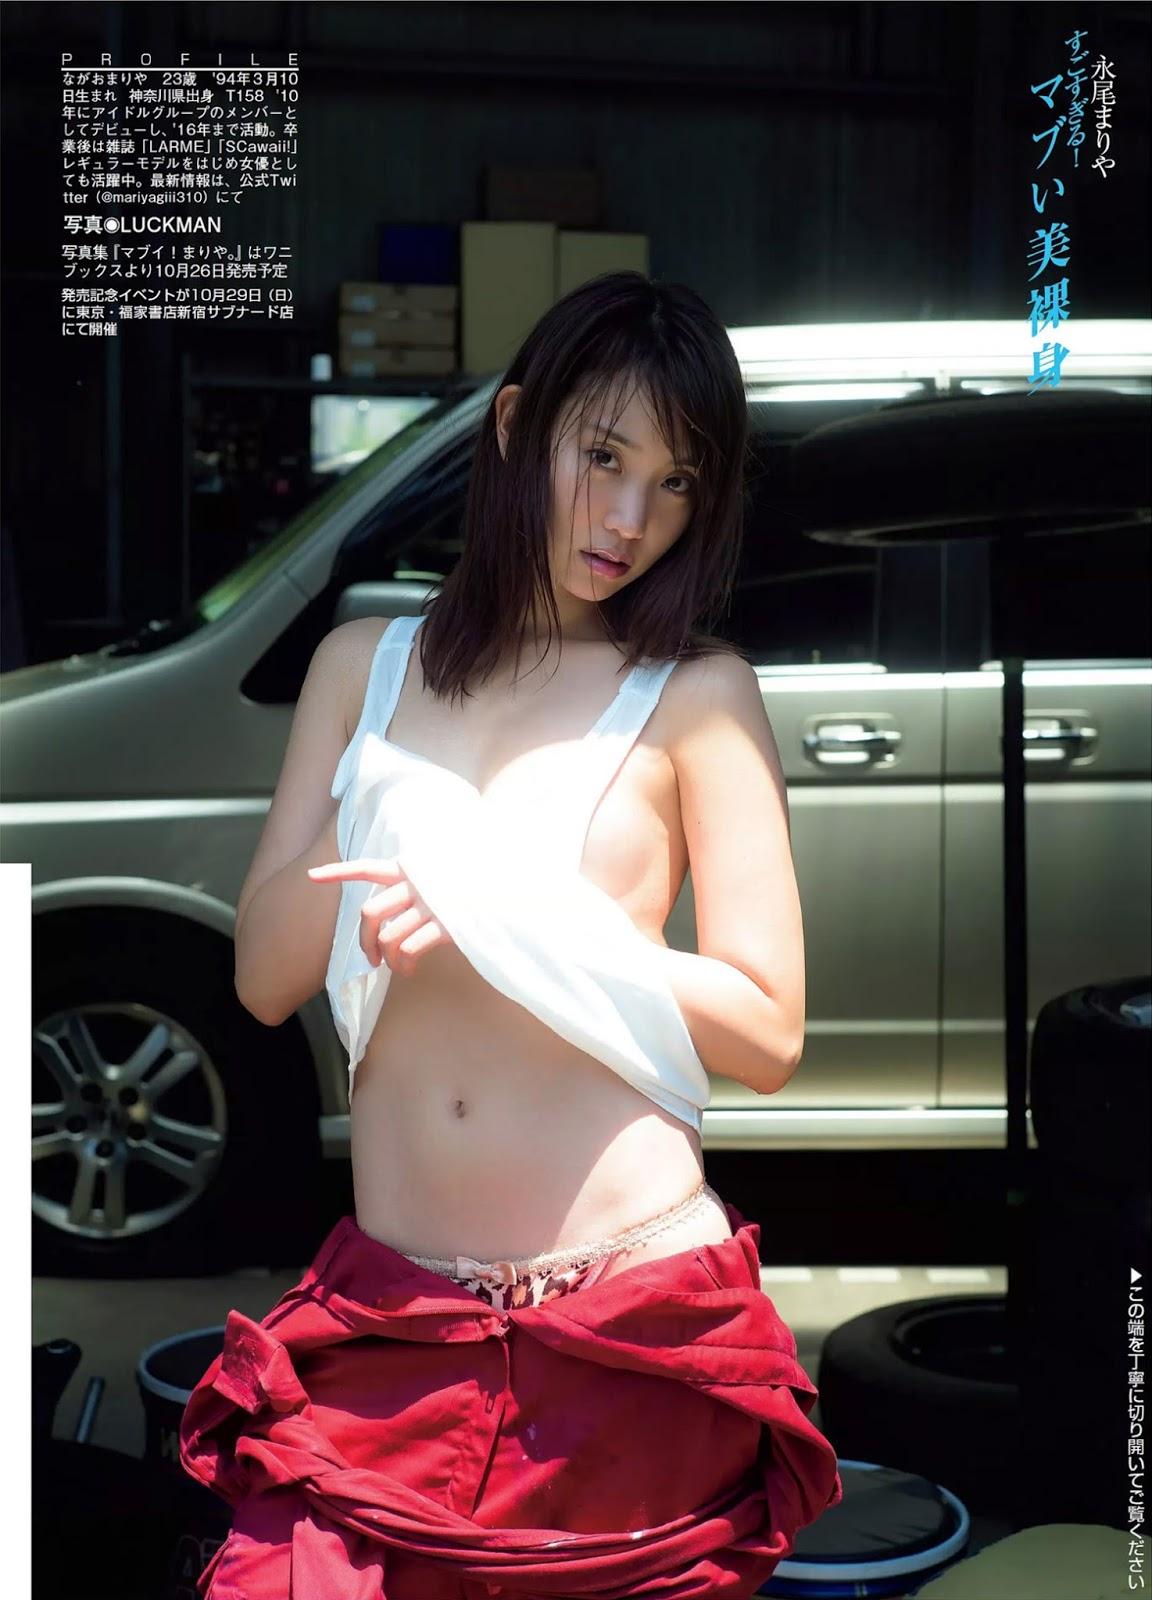 Nagao Mariya 永尾まりや, FLASH 電子版 2017.10.17-24 (フラッシュ 2017年10月17-24日号)